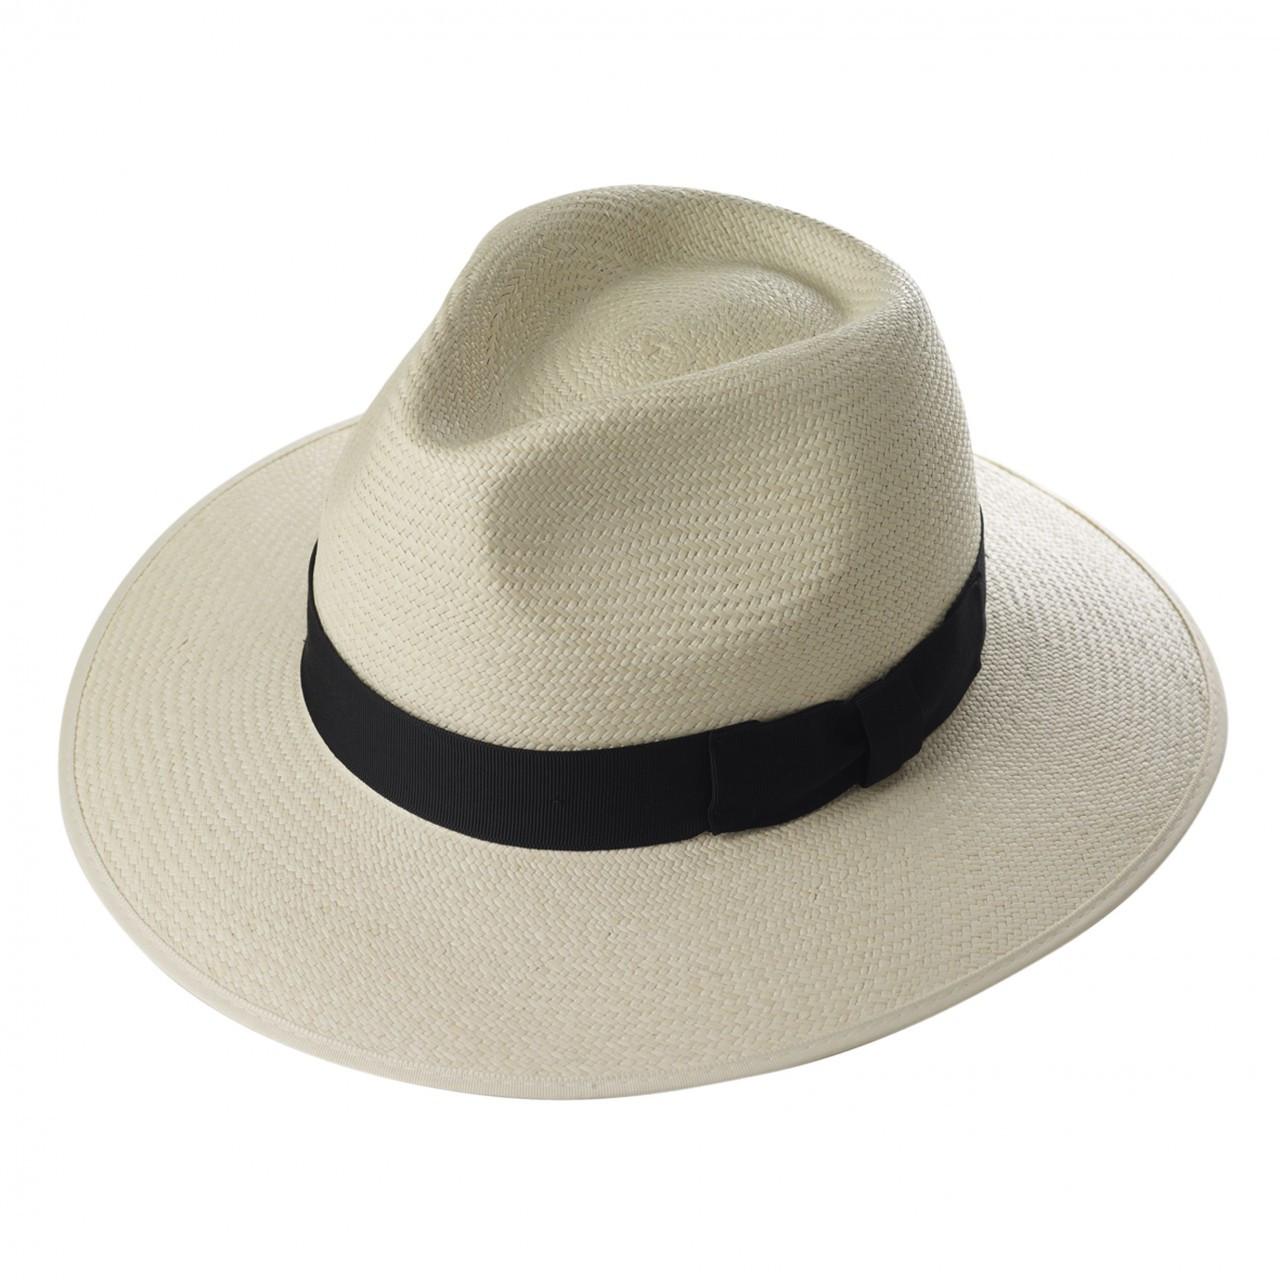 a63499470e5 Down Brim Trilby Panama - Cuenca 3-5 - The Panama Hat Company